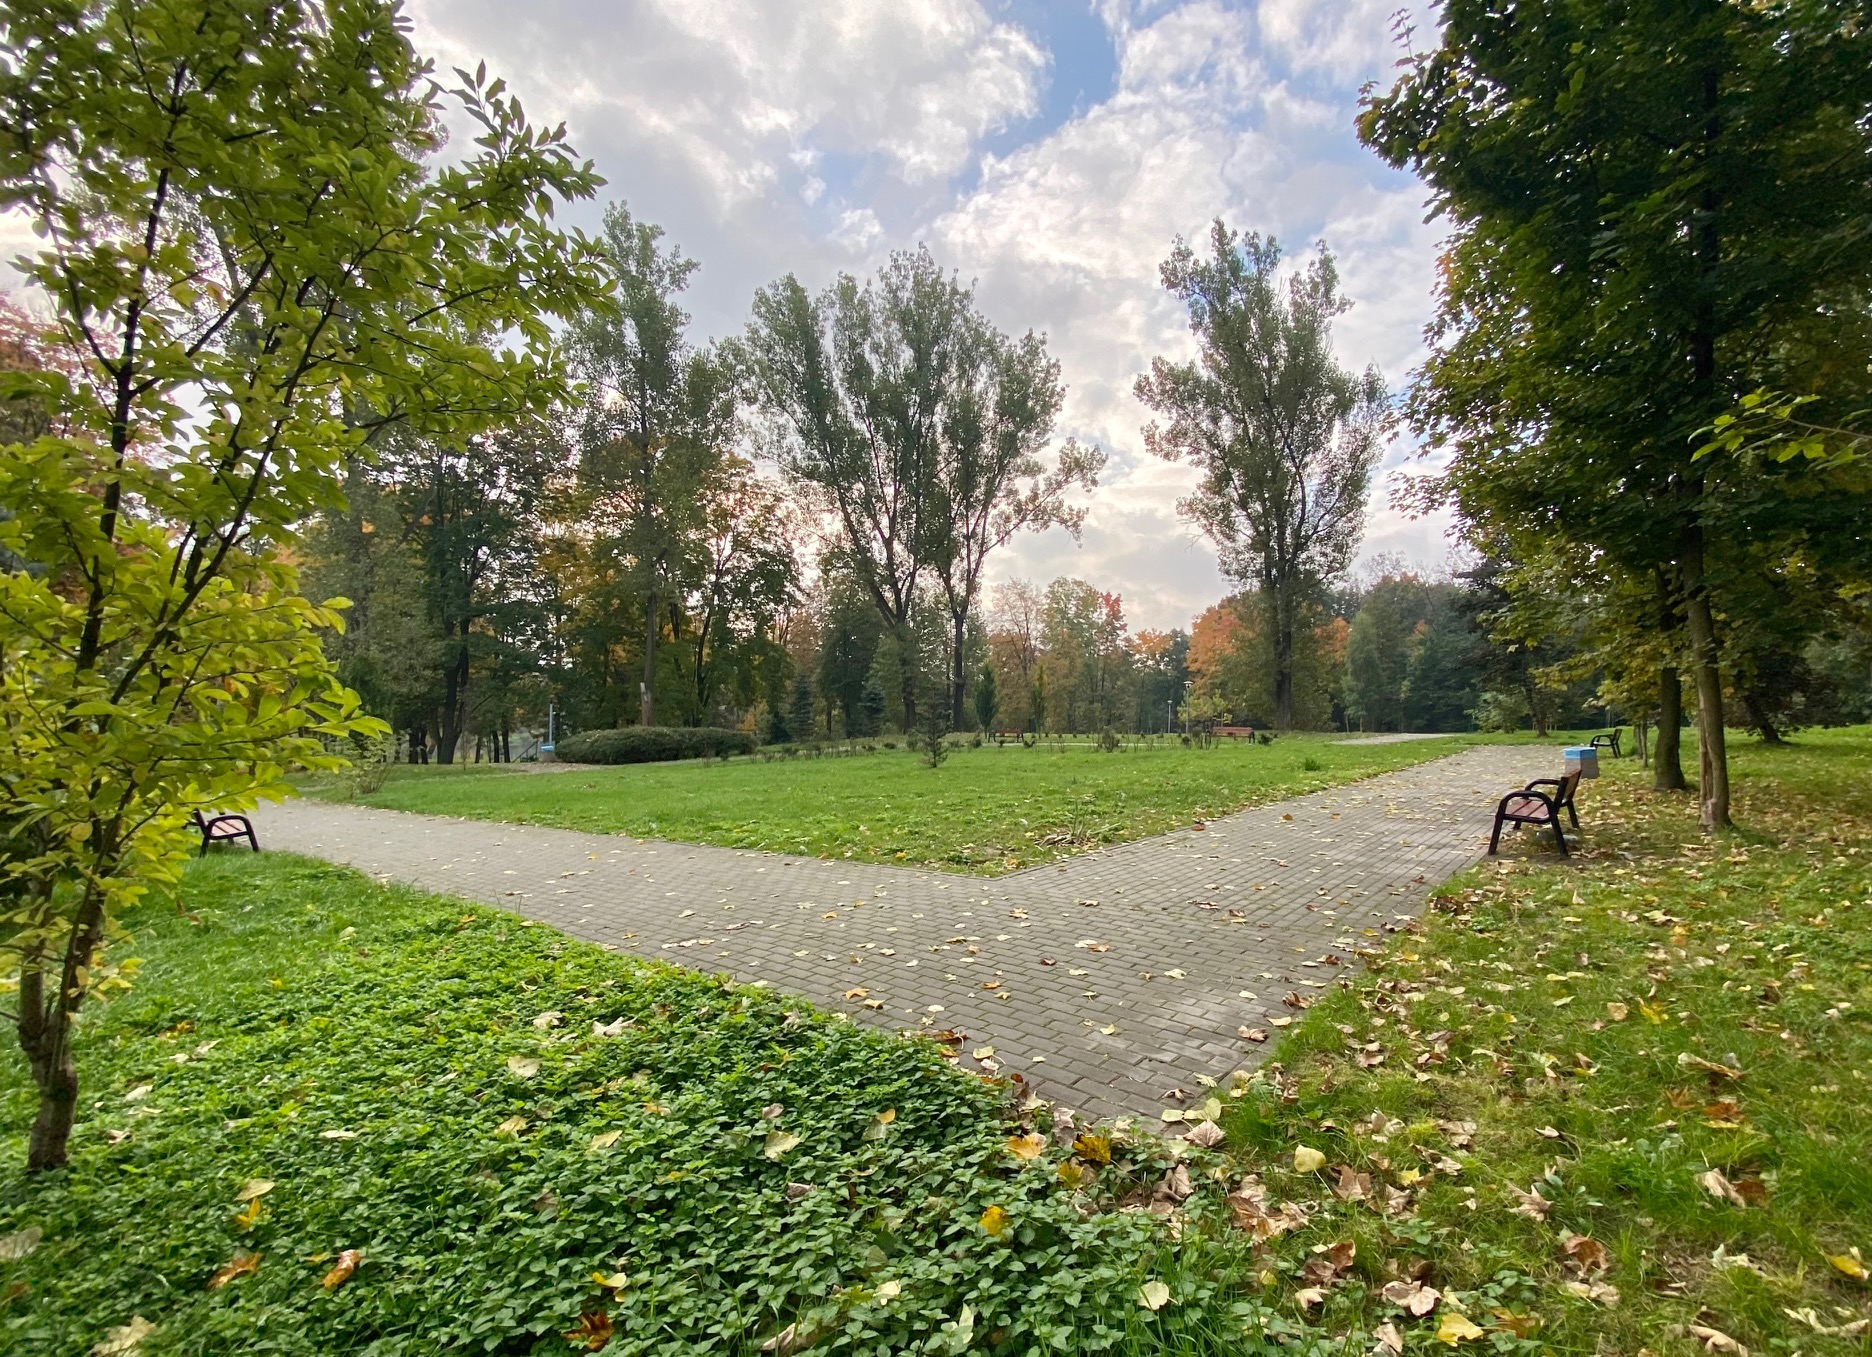 Skwer w Parku Amendy